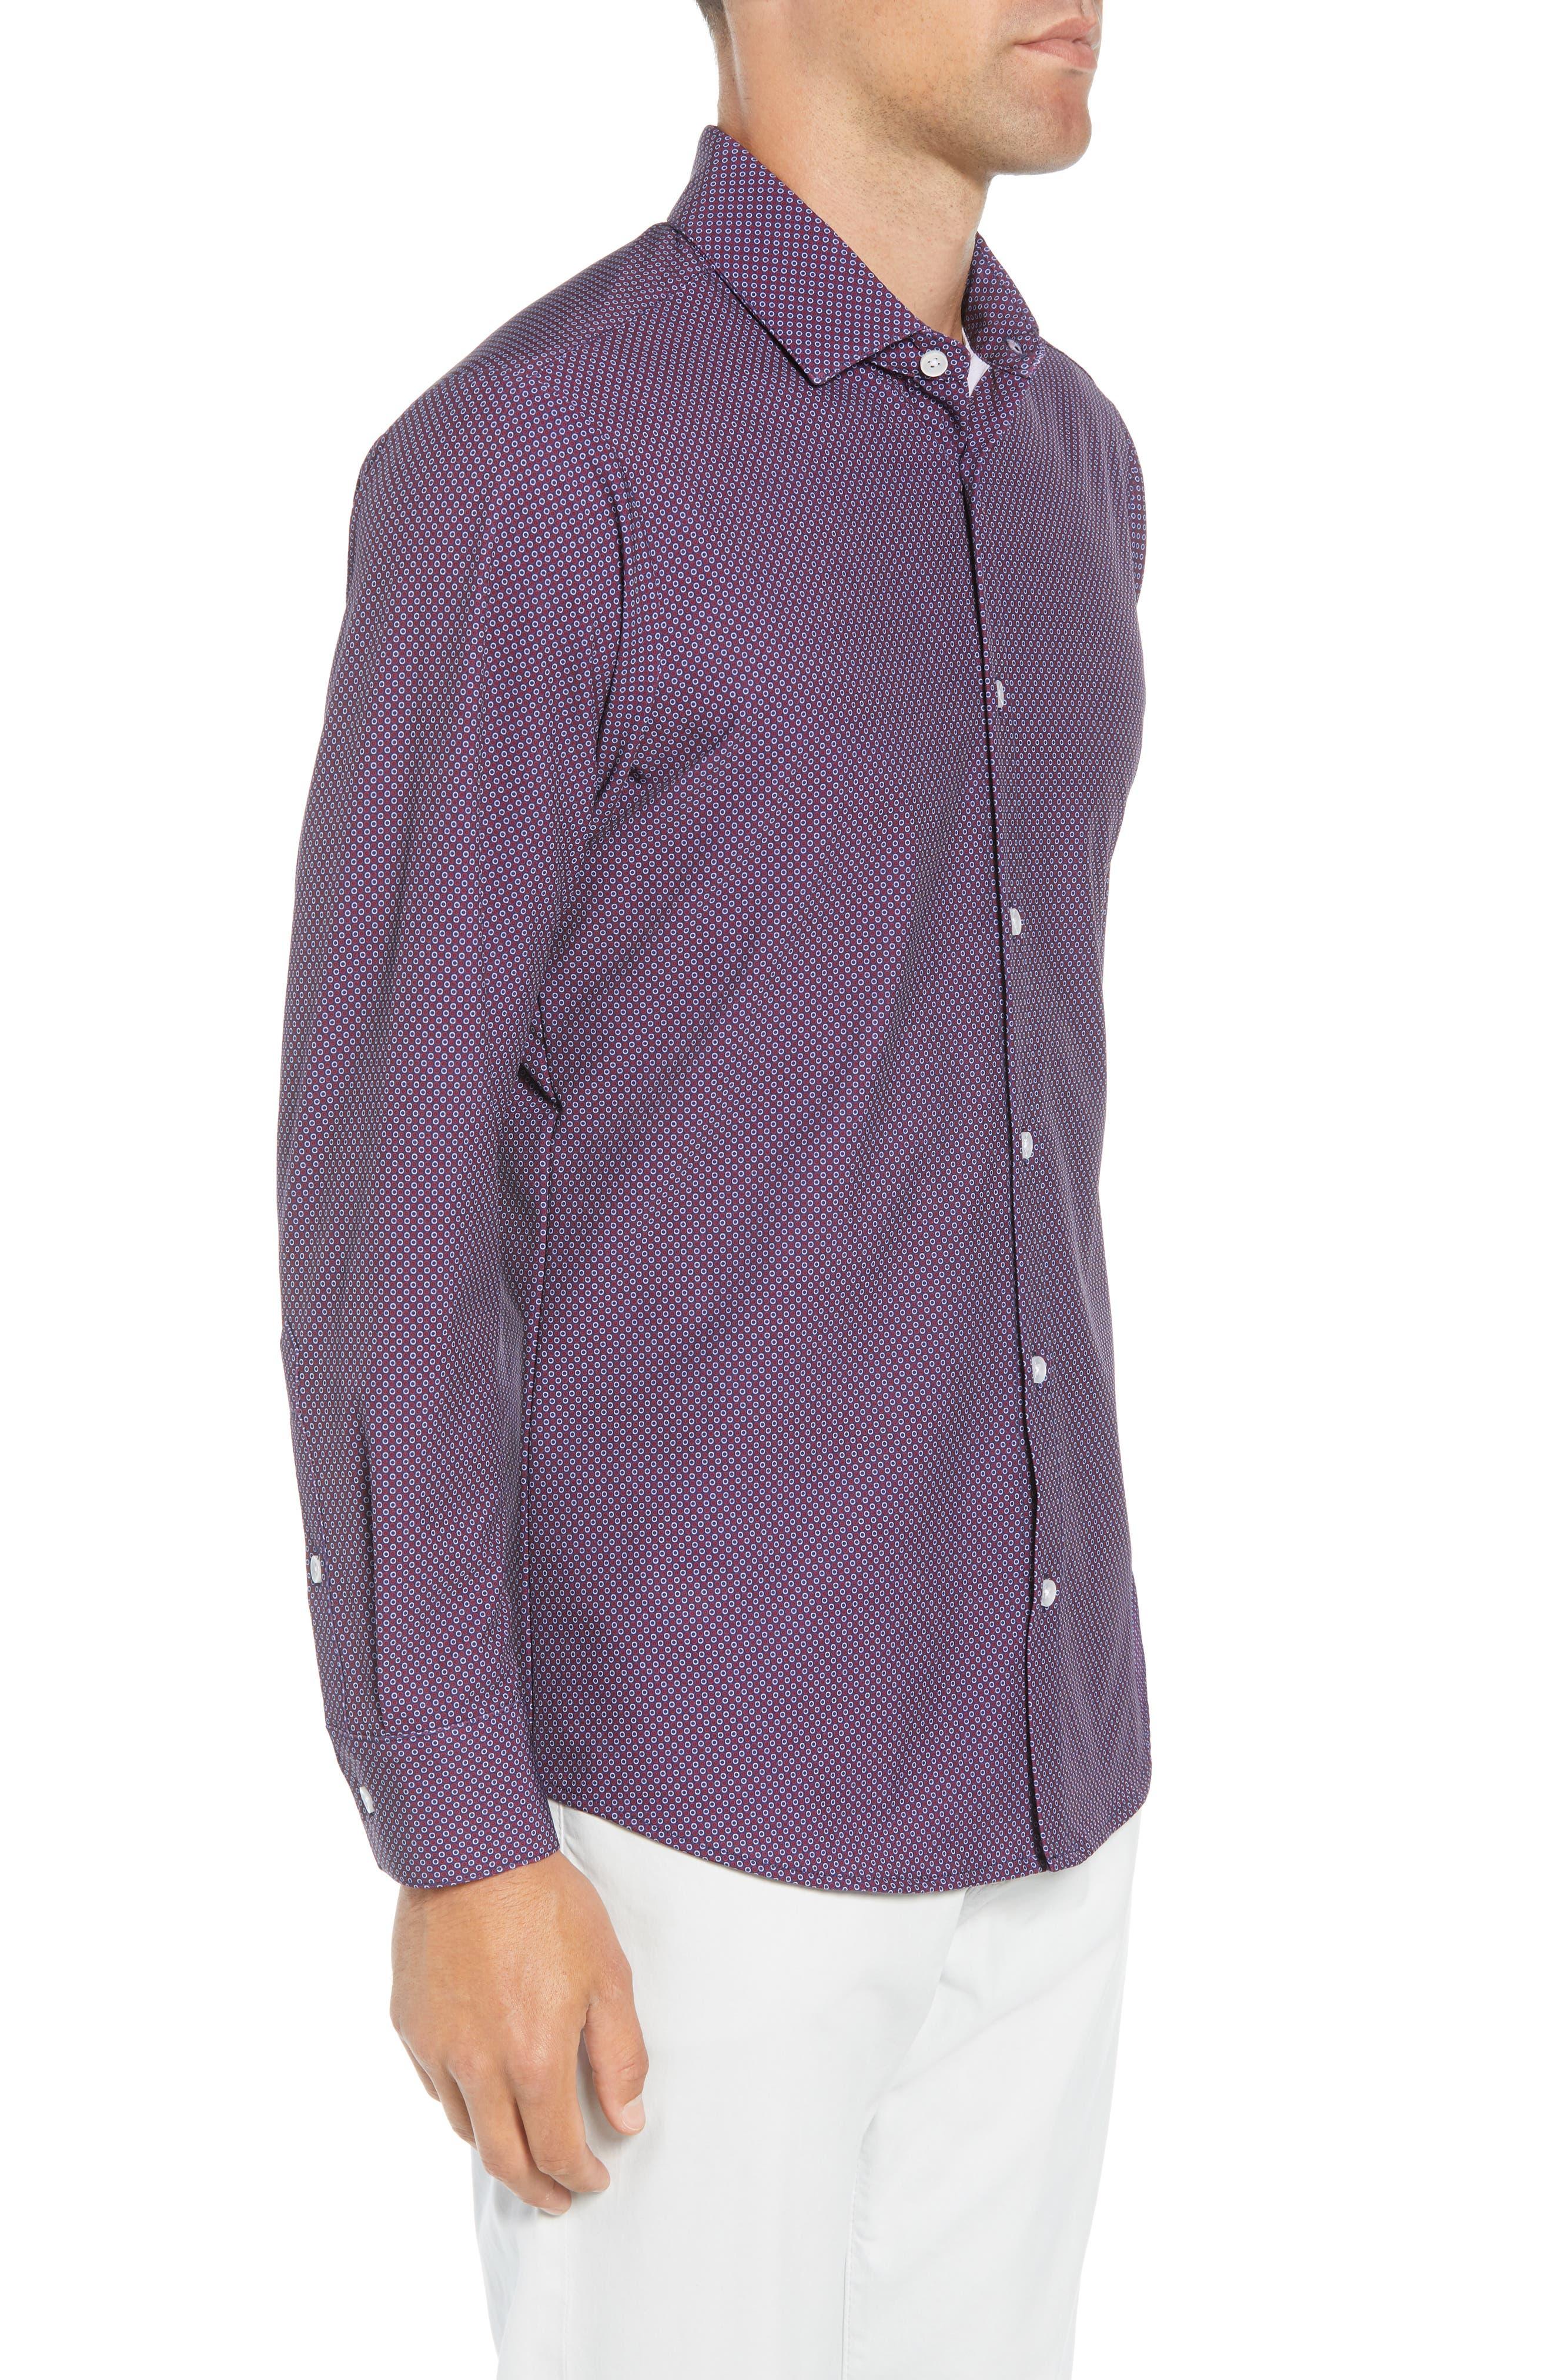 Damon Regular Fit Print Performance Sport Shirt,                             Alternate thumbnail 4, color,                             PLUM